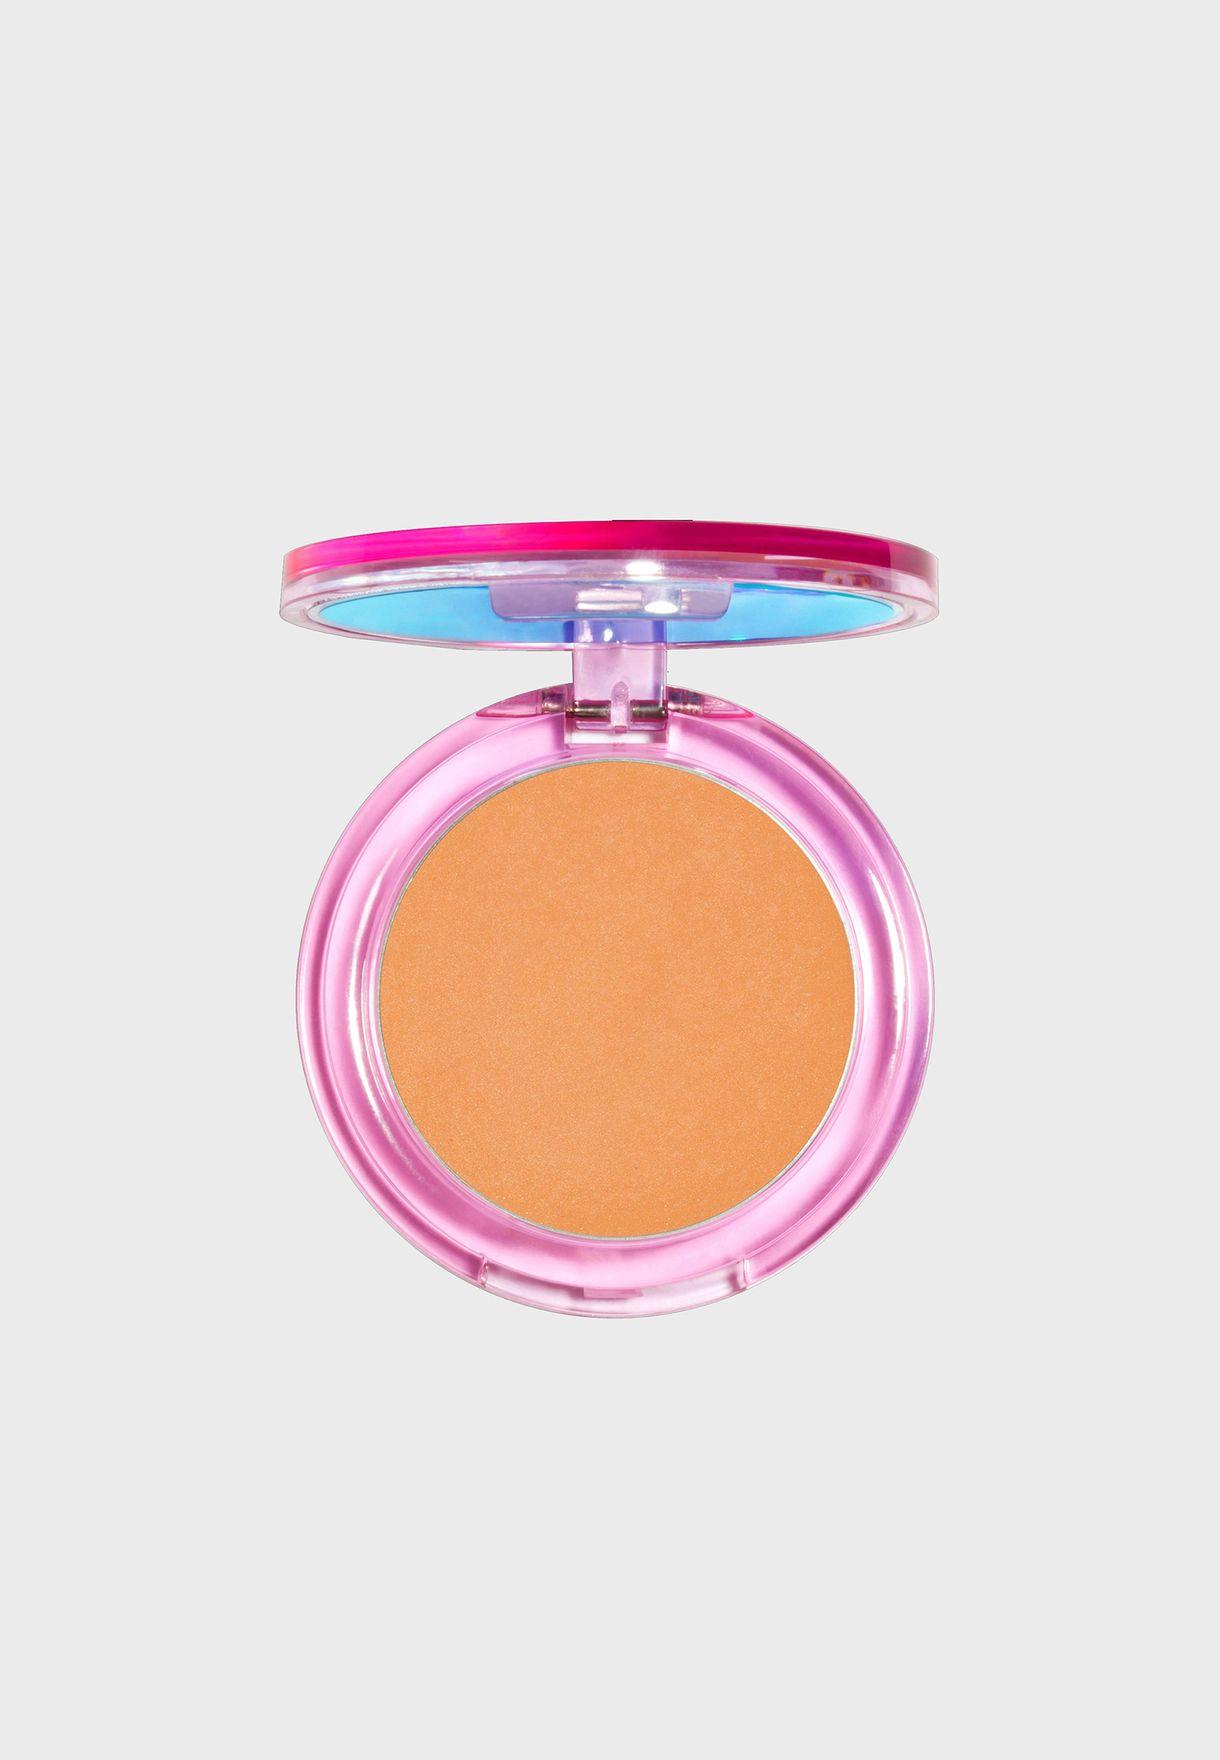 Glow Softwear Blush - Download